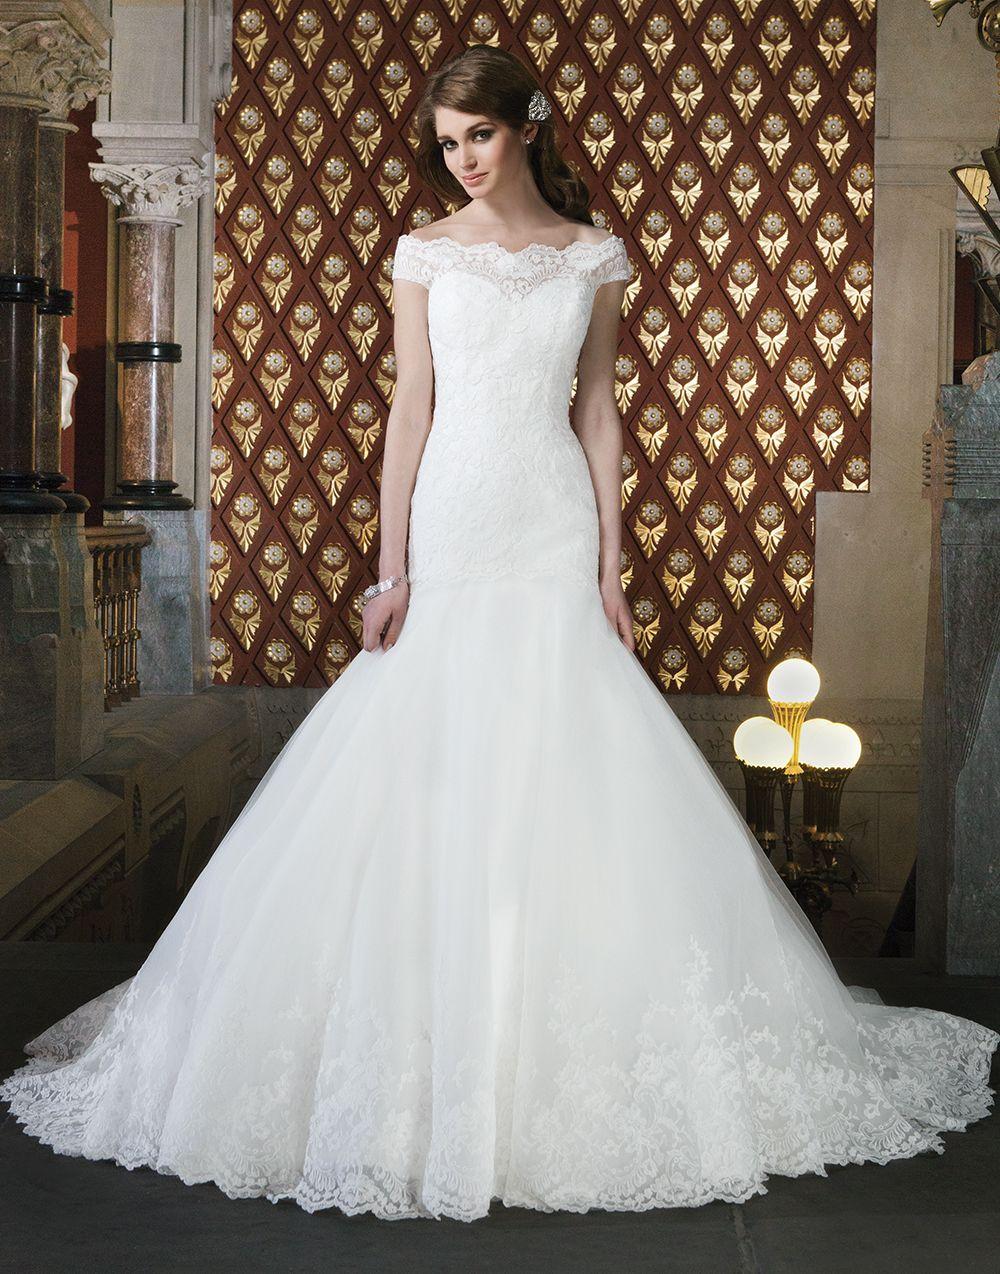 Justin Alexander wedding dresses style 8708 | Satin fabric, Neckline ...